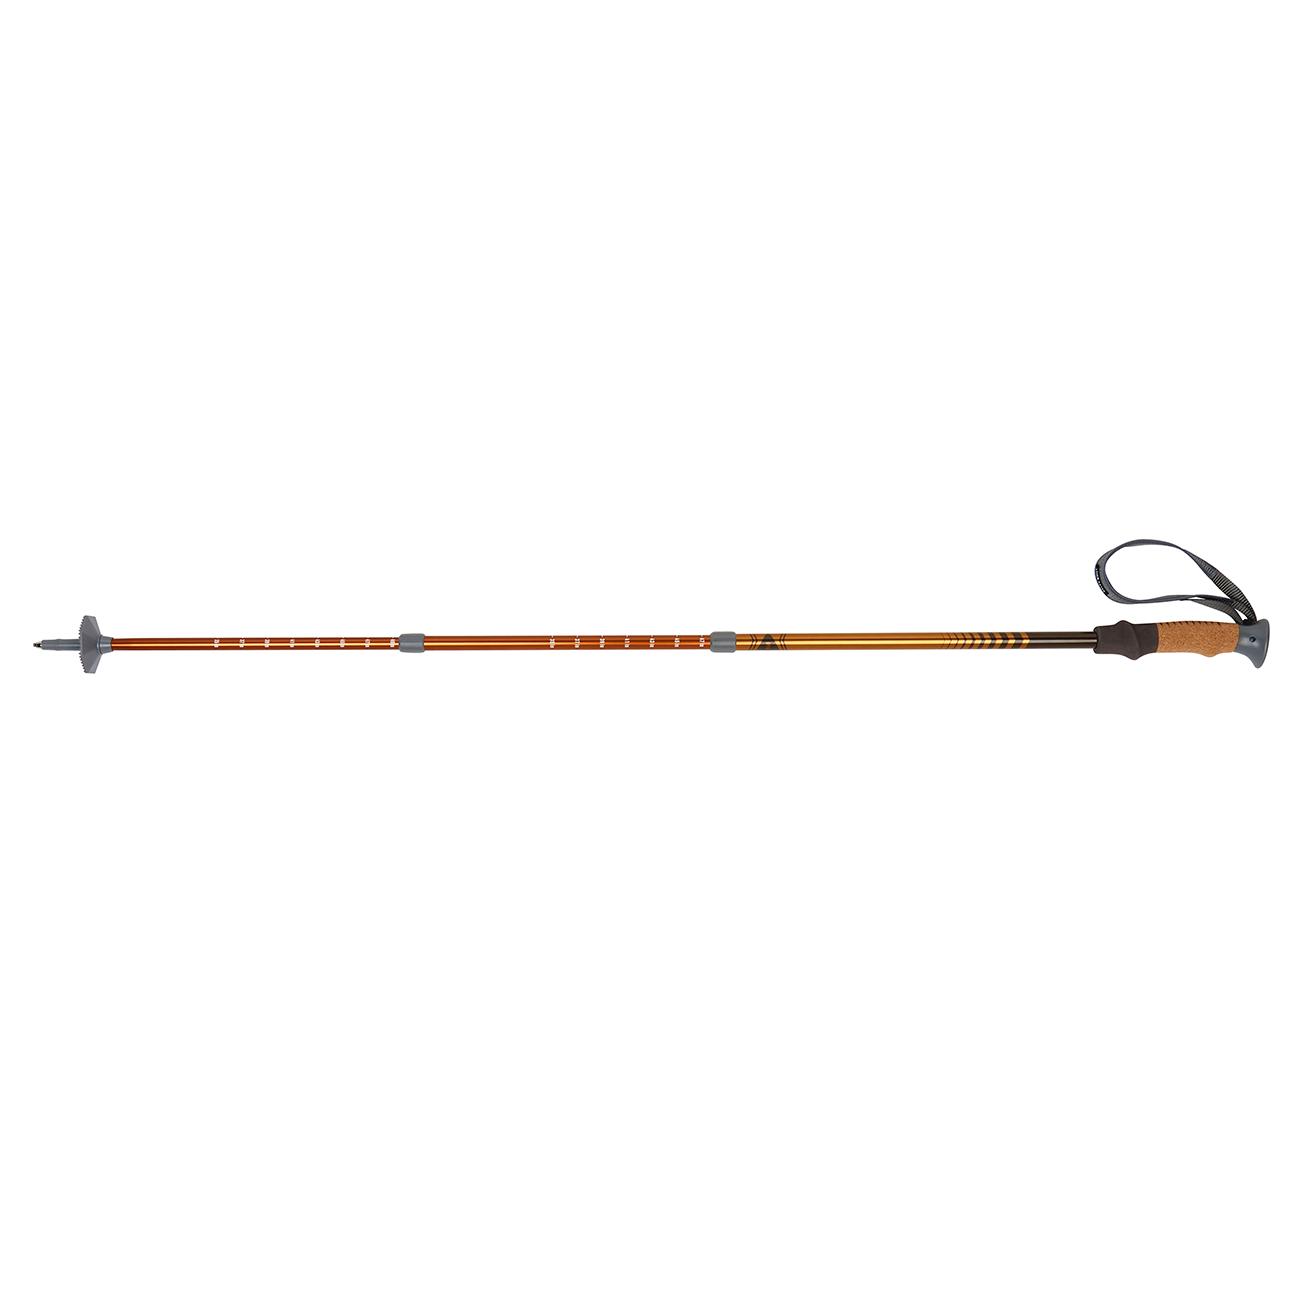 Kelty-Range 1.0 Trekking Pole - Single